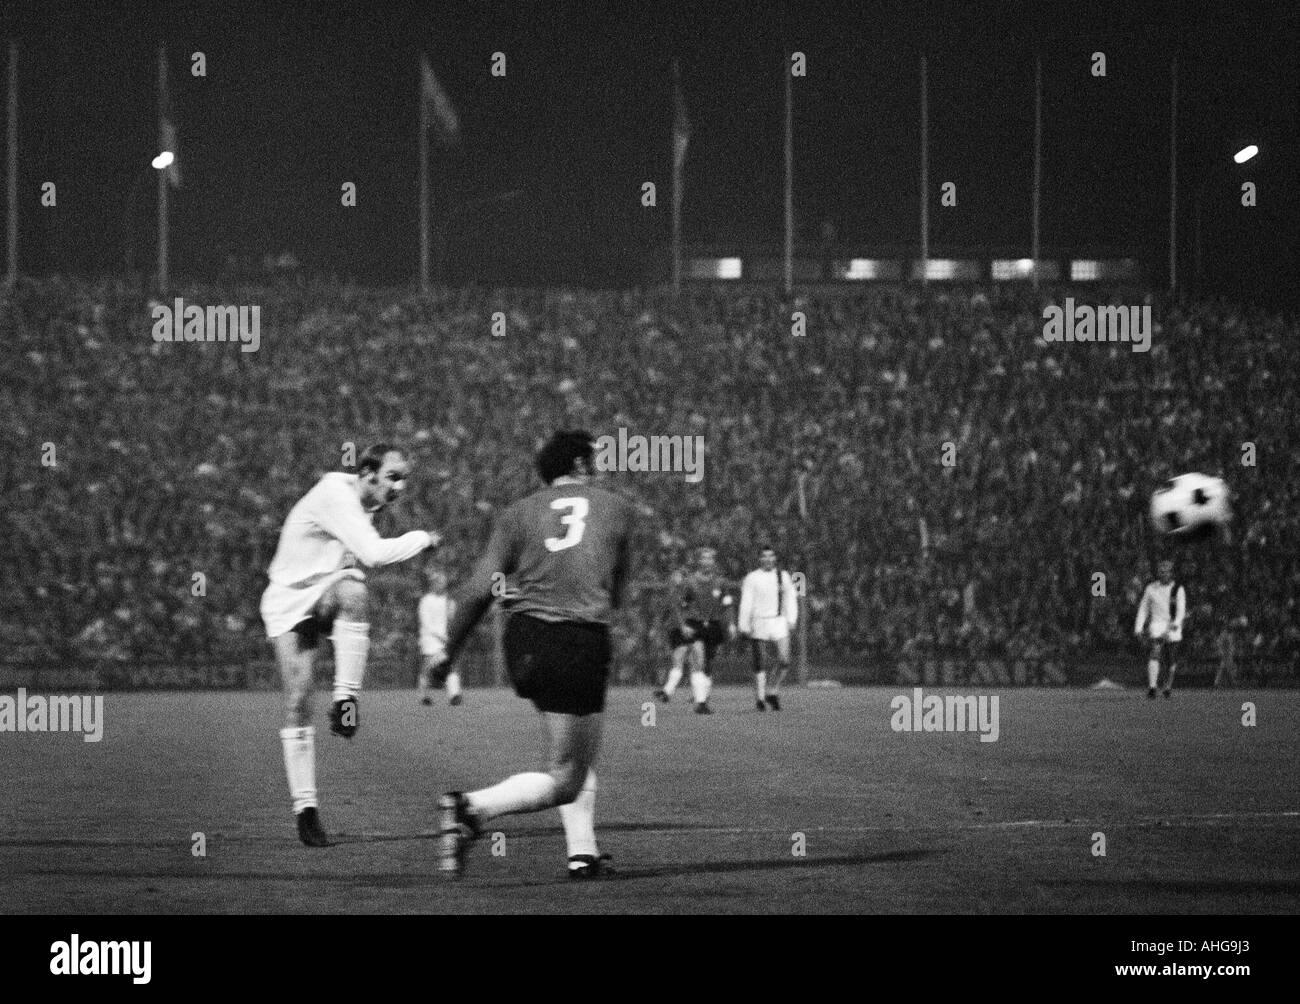 football, Bundesliga, 1970/1971, Borussia Moenchengladbach versus Hanover 96 0:0, Boekelberg Stadium, scene of the match, Horst Koeppel (MG) shots on goal and Klaus Bohnsack (96, 3) - Stock Image